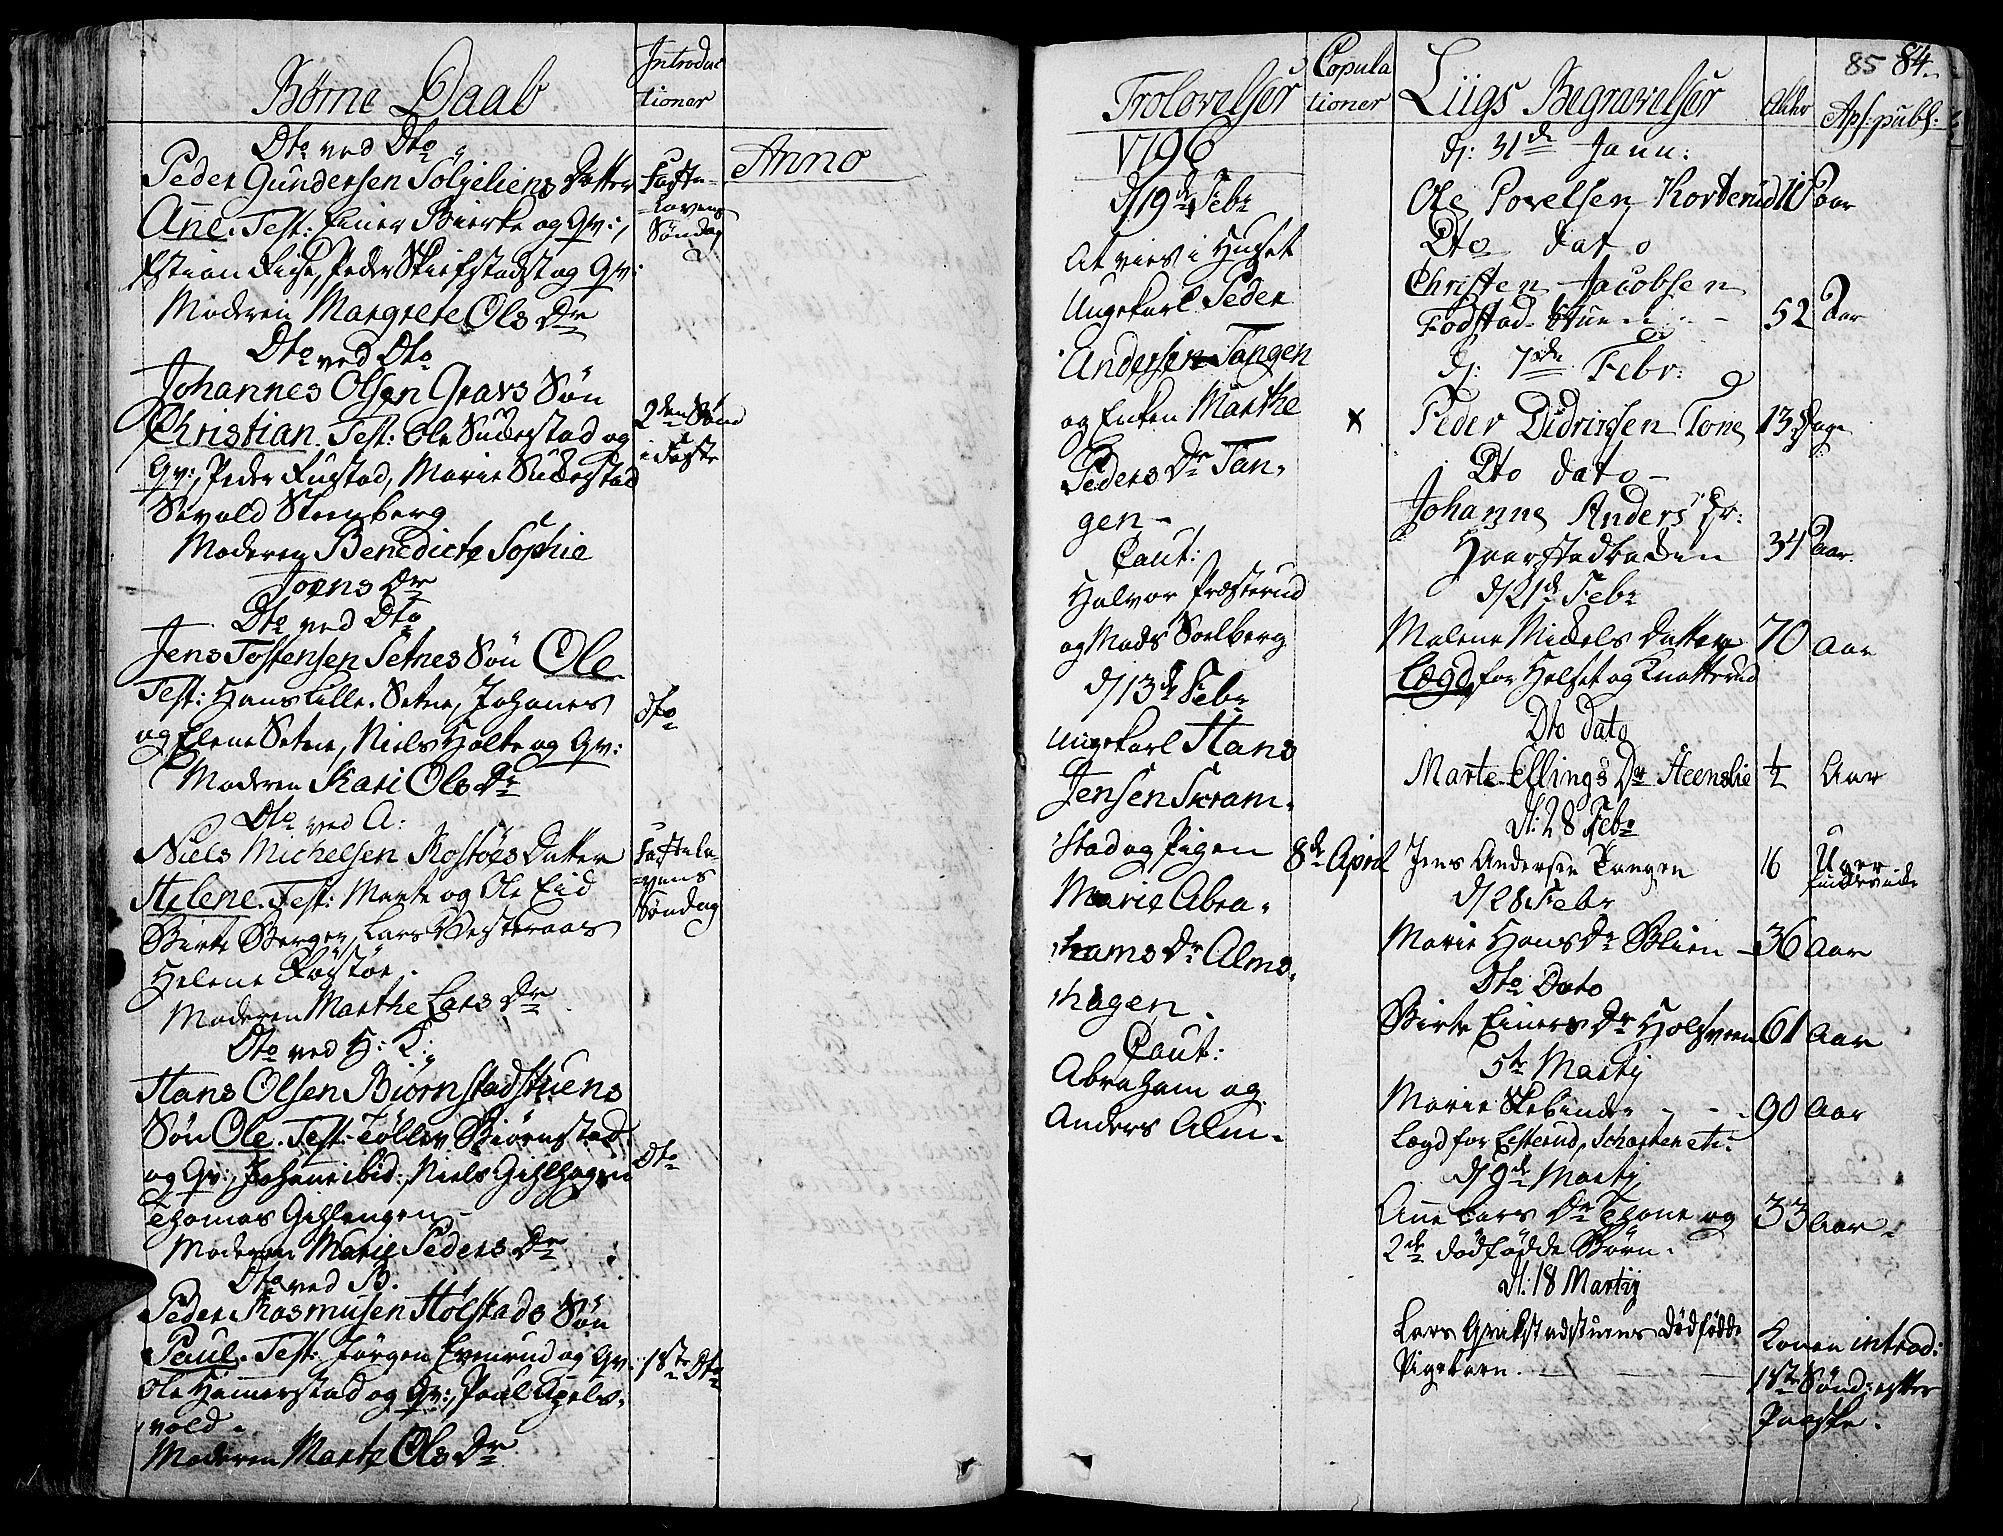 SAH, Toten prestekontor, Ministerialbok nr. 7, 1794-1809, s. 85